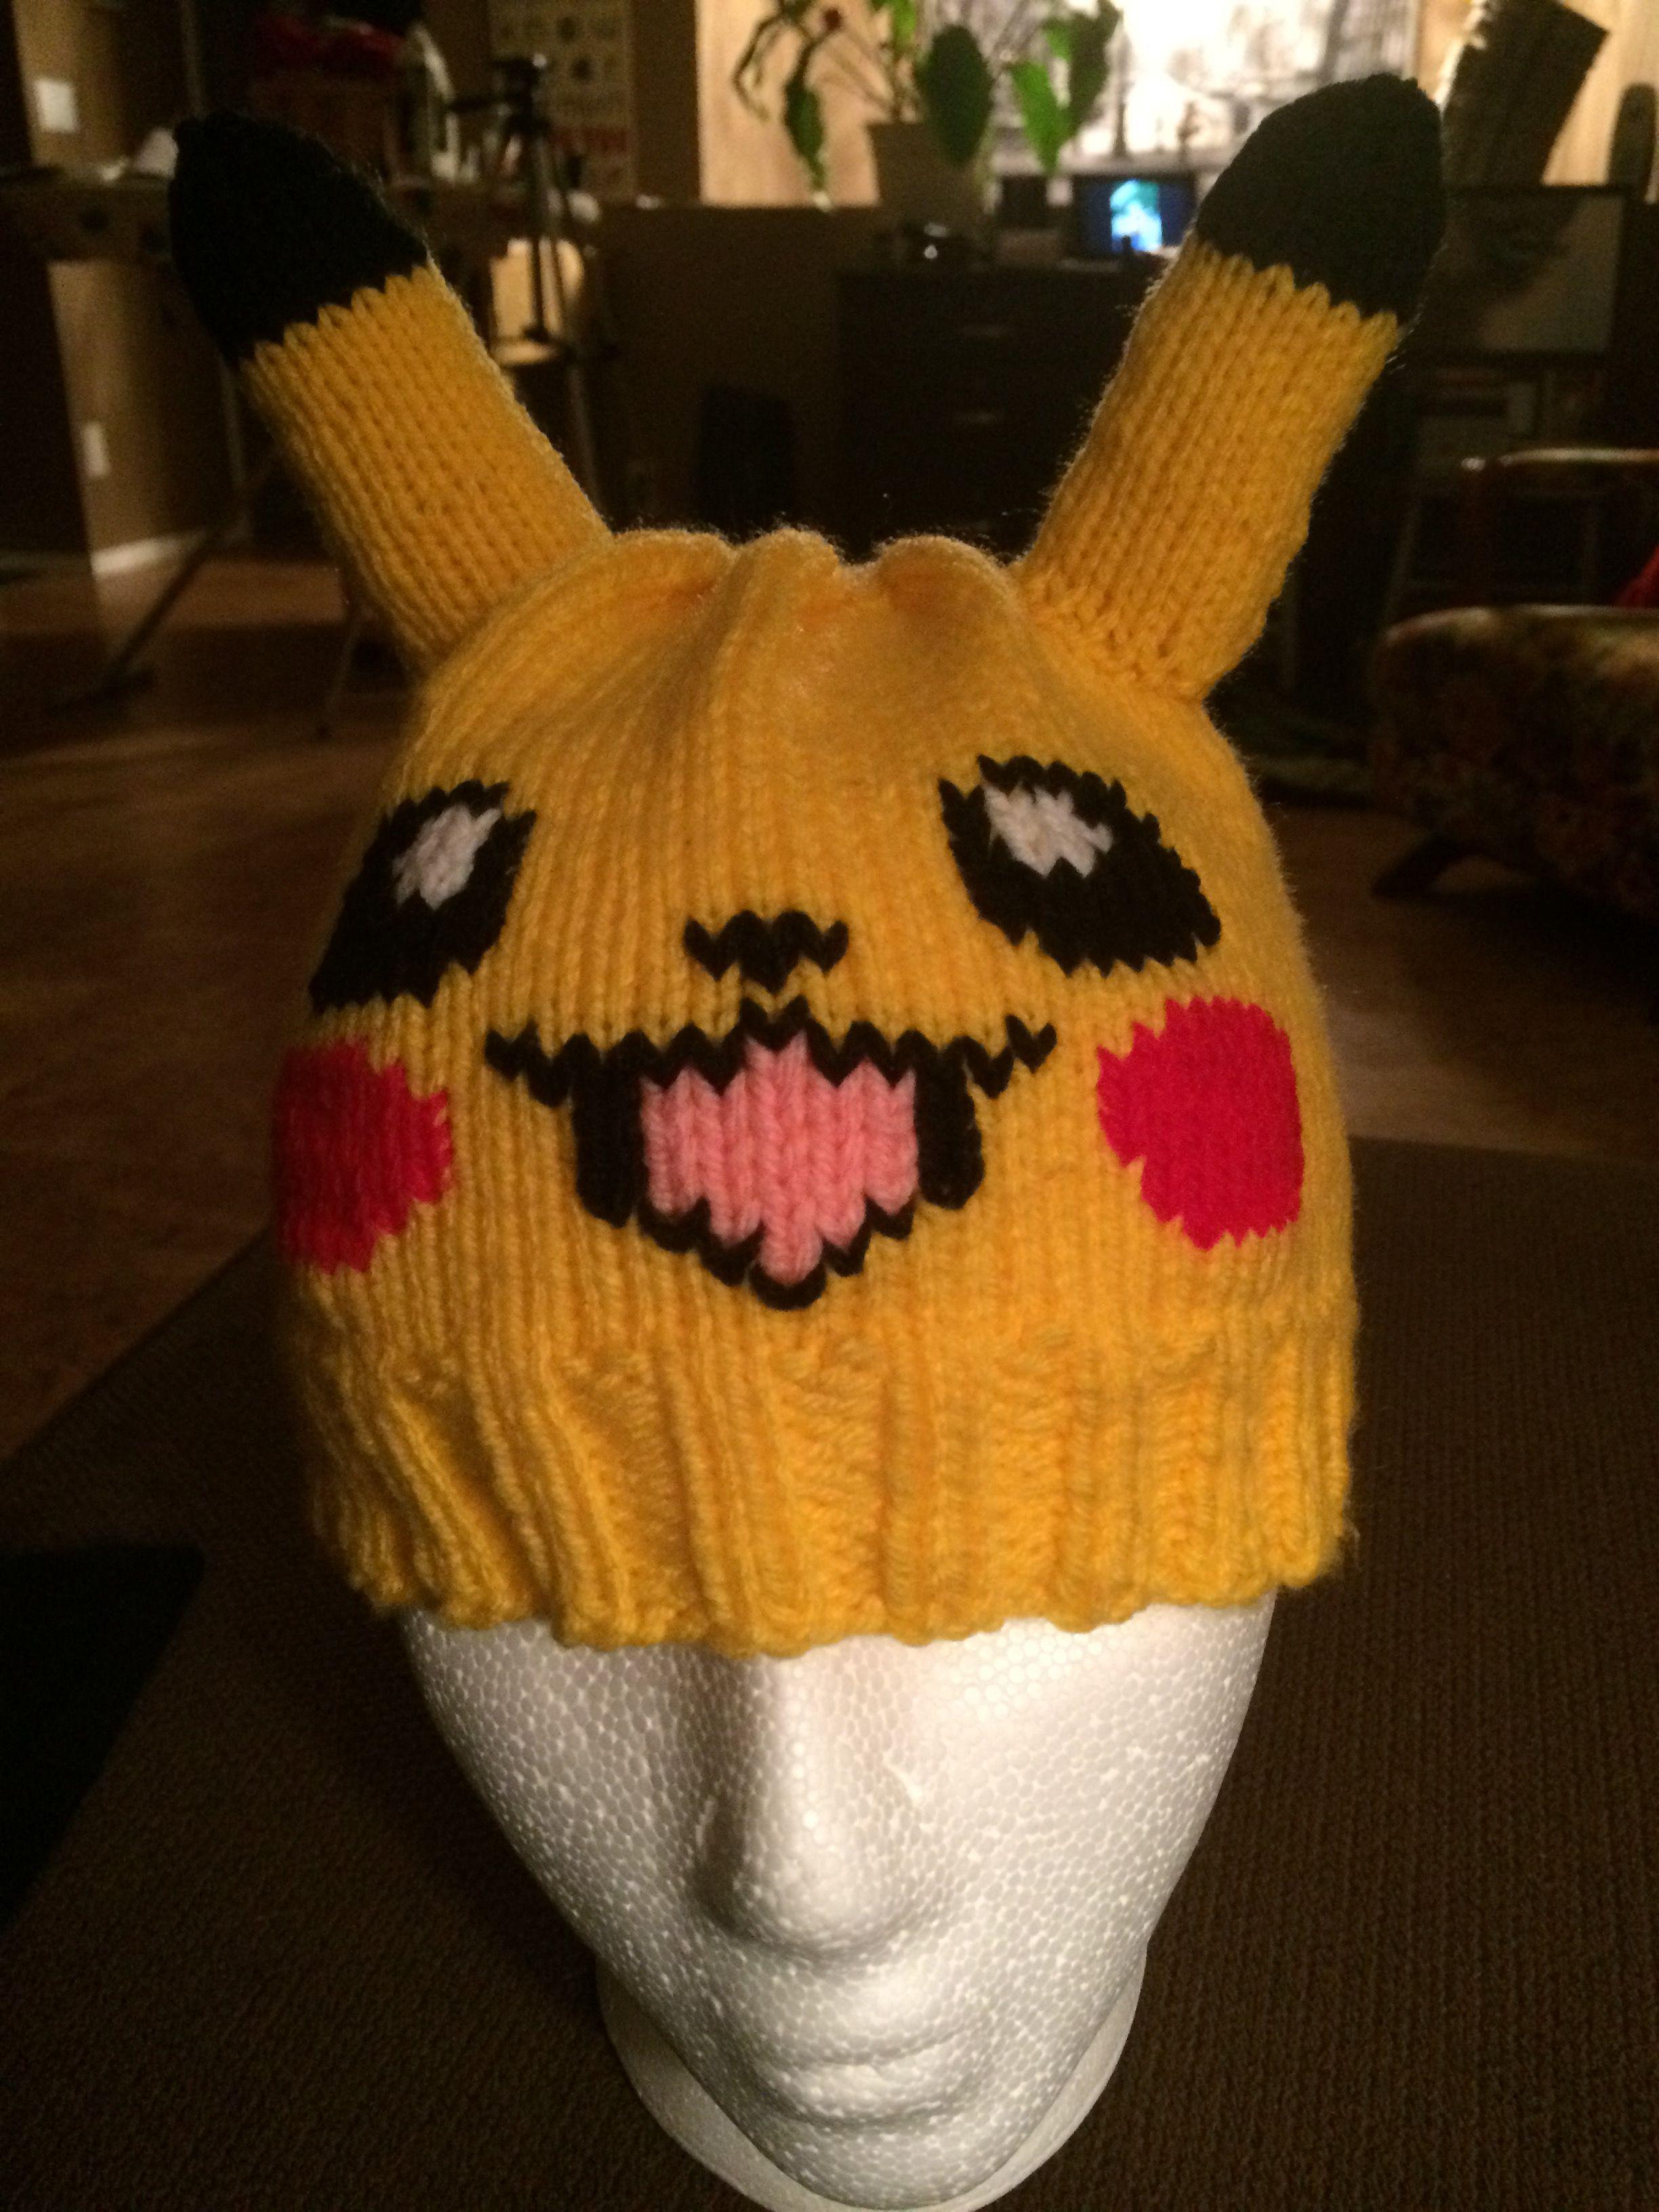 2bcb5fbfd Pin by Karin LaPointe on Pikachu   Knitted hats, Pikachu hat, Knitting